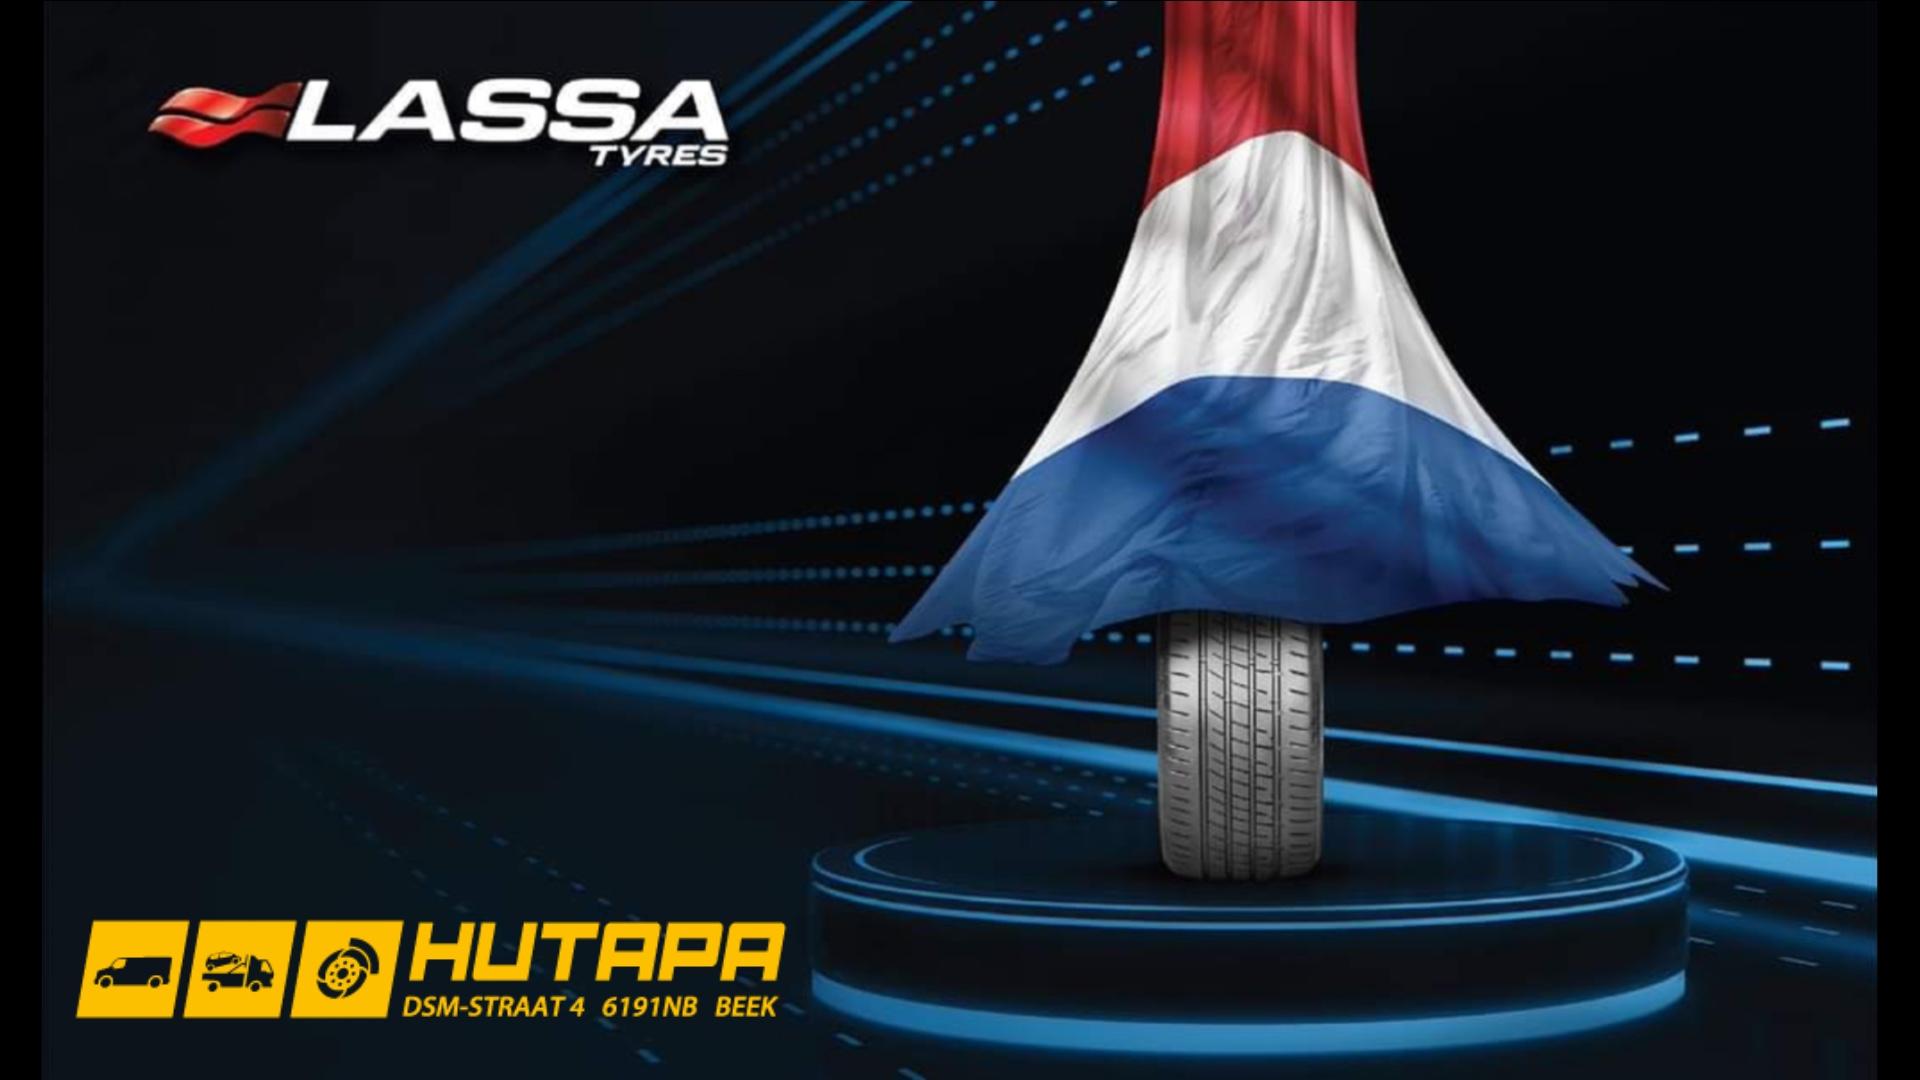 Lassa - Autogarage Hutapa